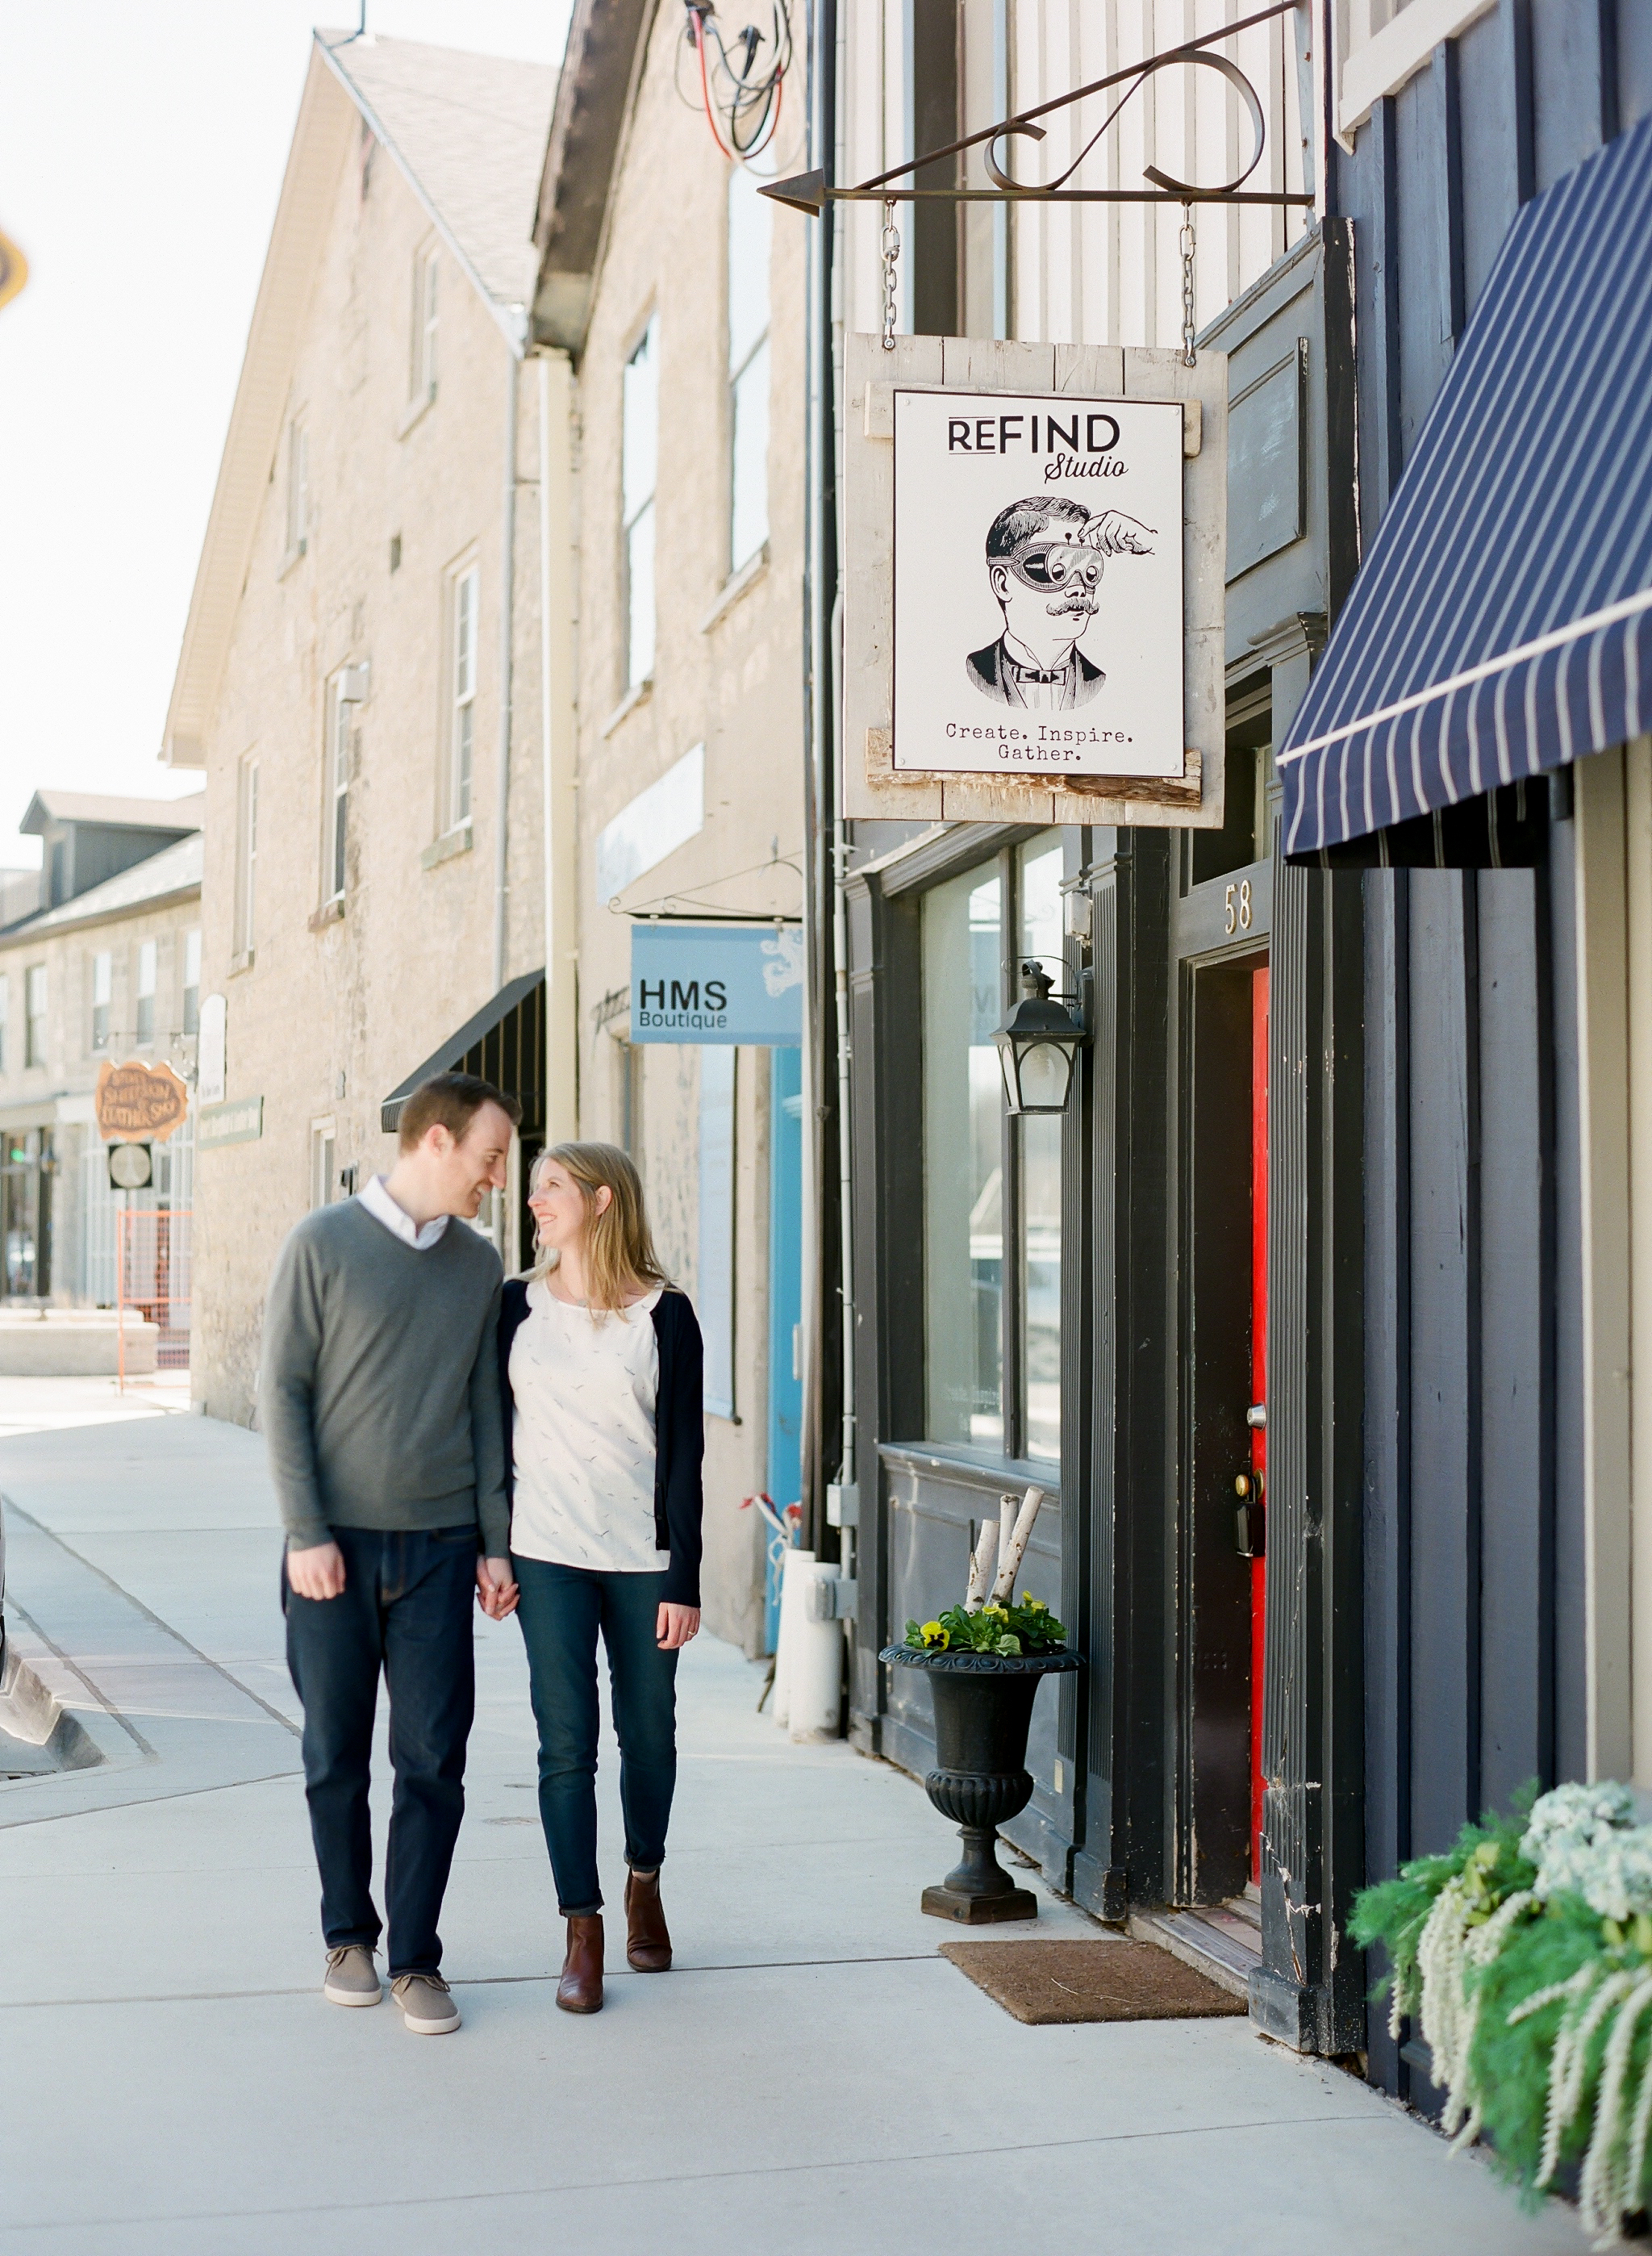 Jacqueline Anne Photography - Elora Engagement Session-25.jpg